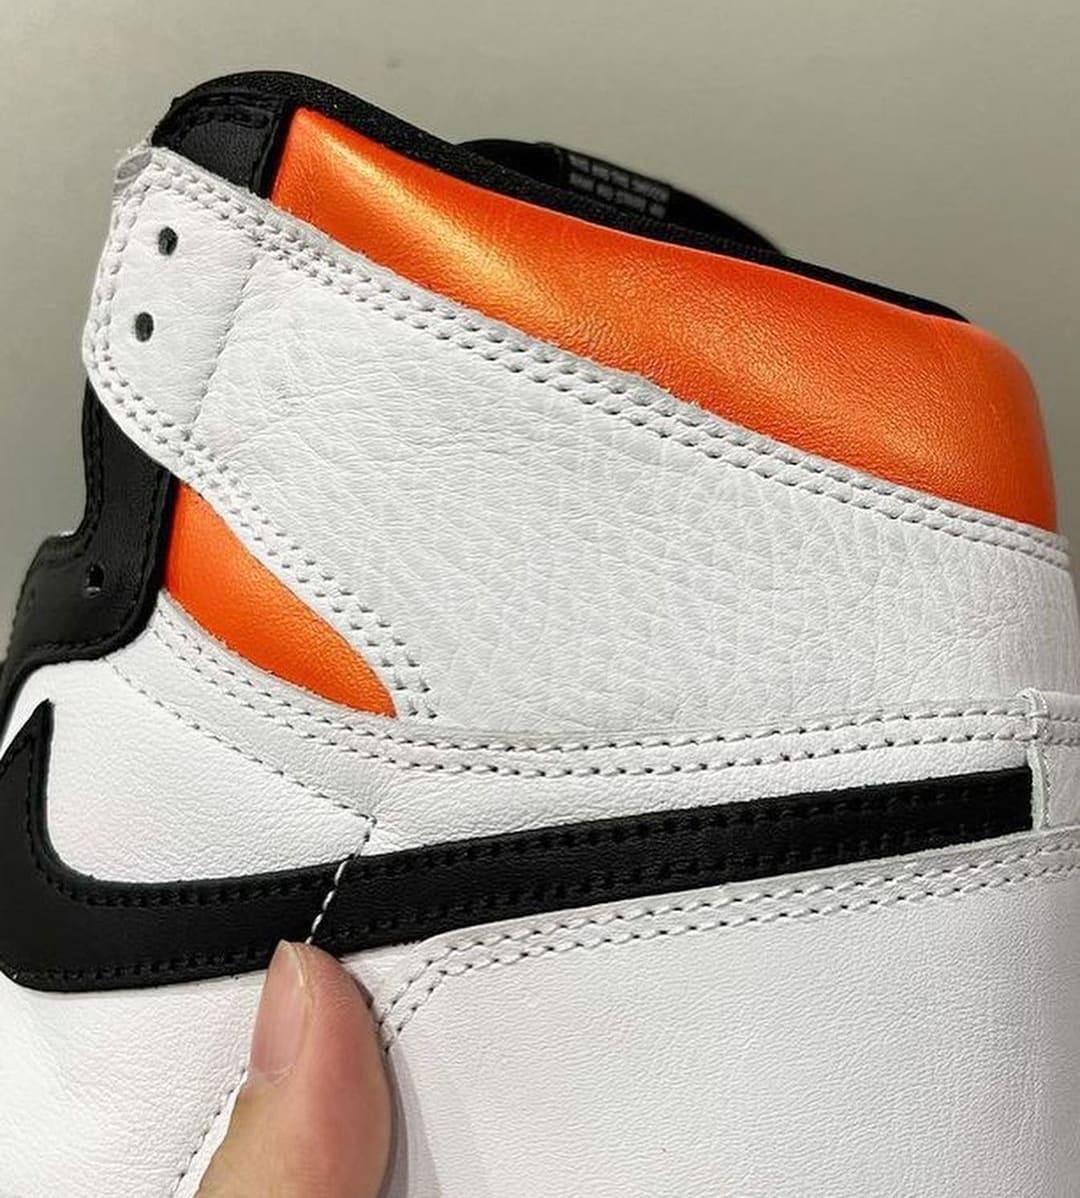 Air Jordan 1 Retro High OG 'Electro Orange' 555088-180 Heel